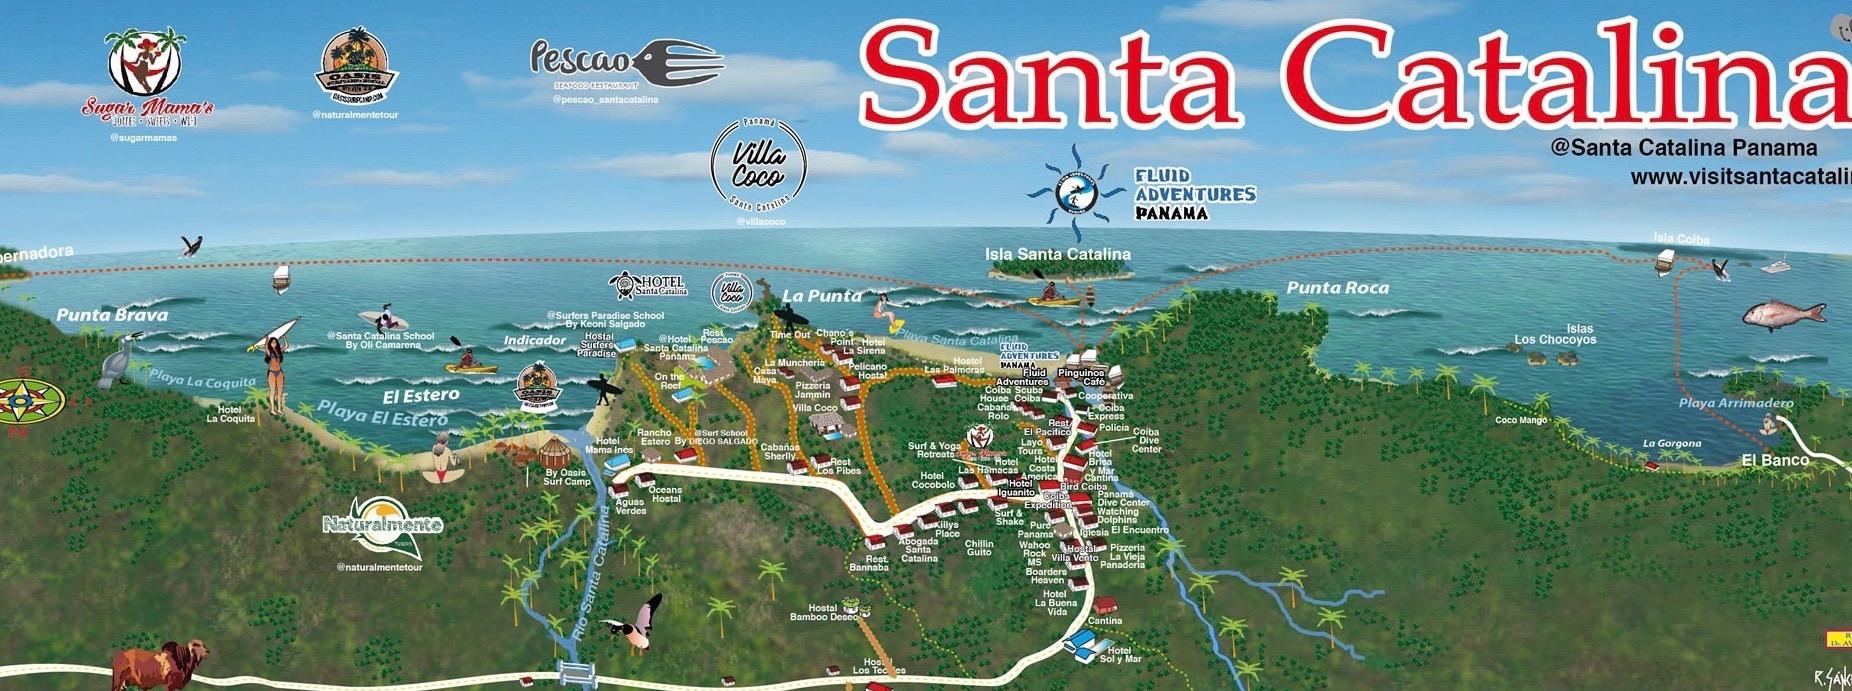 mapa-santa-catalina-full-1 copy.jpg